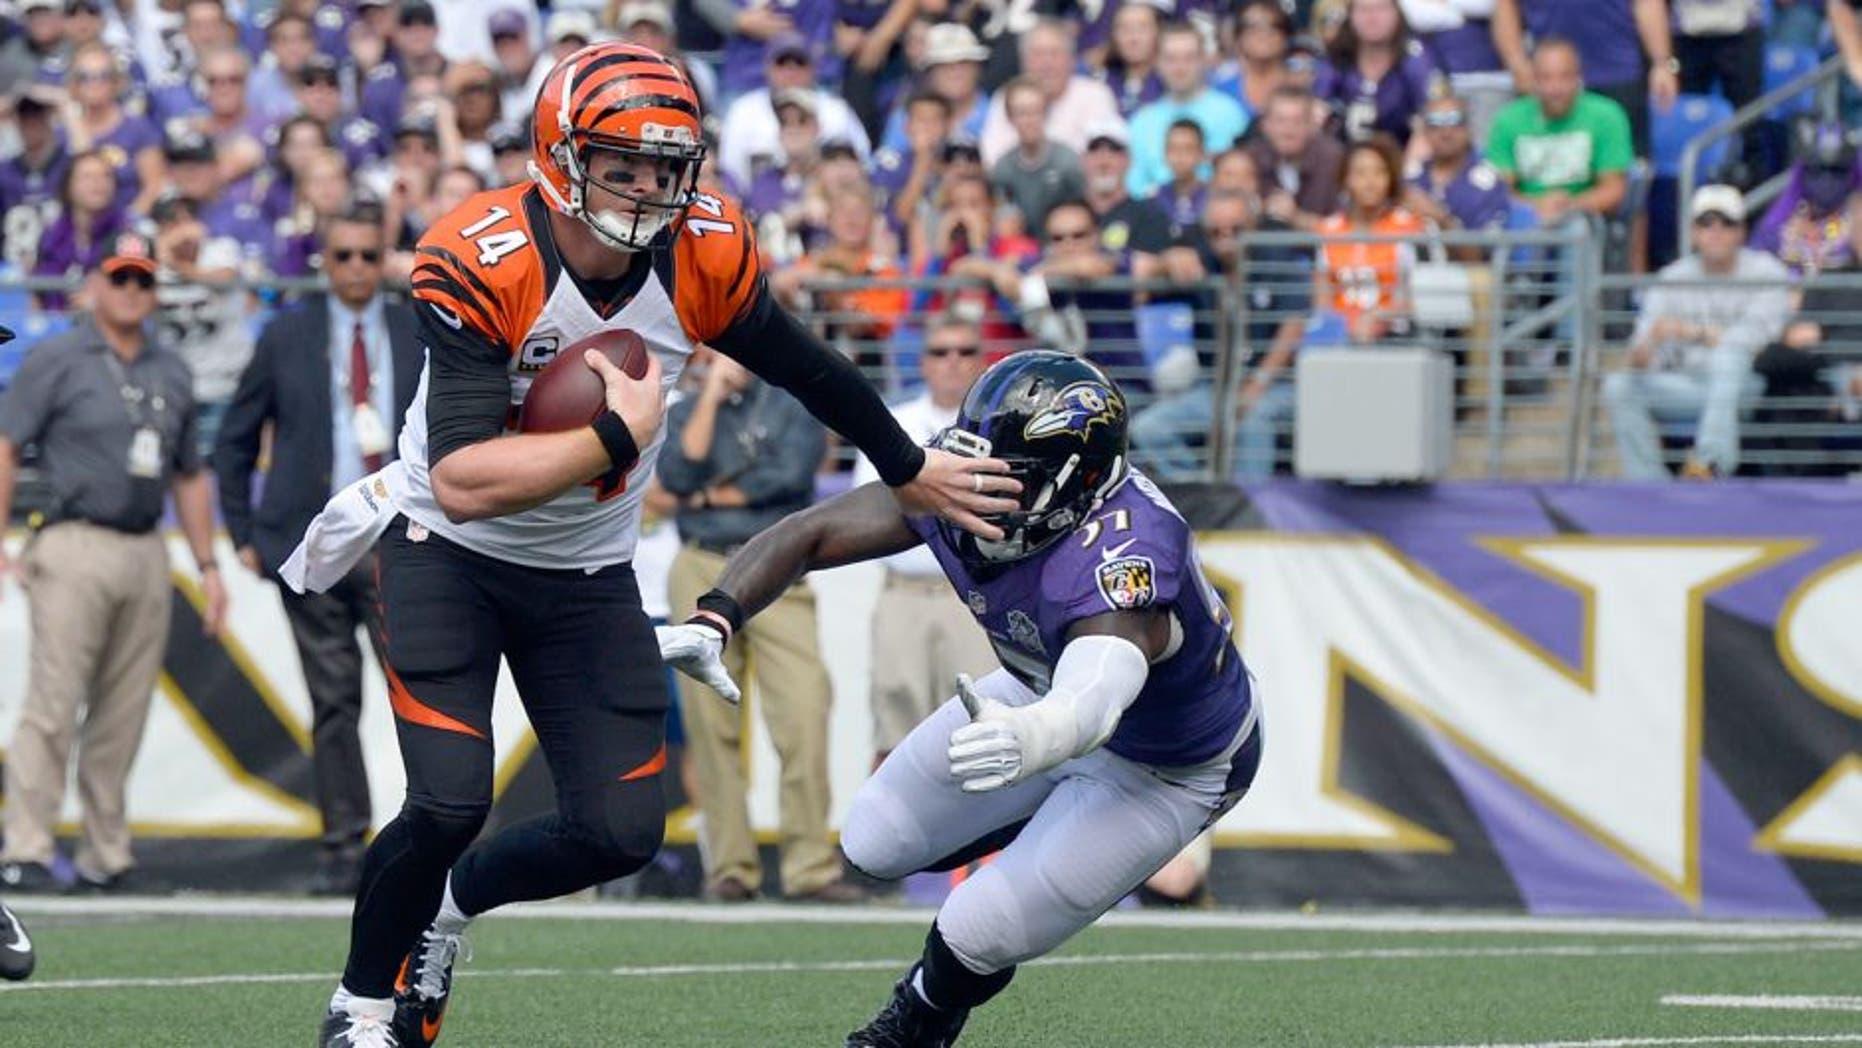 Sep 27, 2015; Baltimore, MD, USA; Cincinnati Bengals quarterback Andy Dalton (14) stiff arms Baltimore Ravens inside linebacker C.J. Mosley (57) as he run during the first quarter at M&T Bank Stadium. Mandatory Credit: Tommy Gilligan-USA TODAY Sports